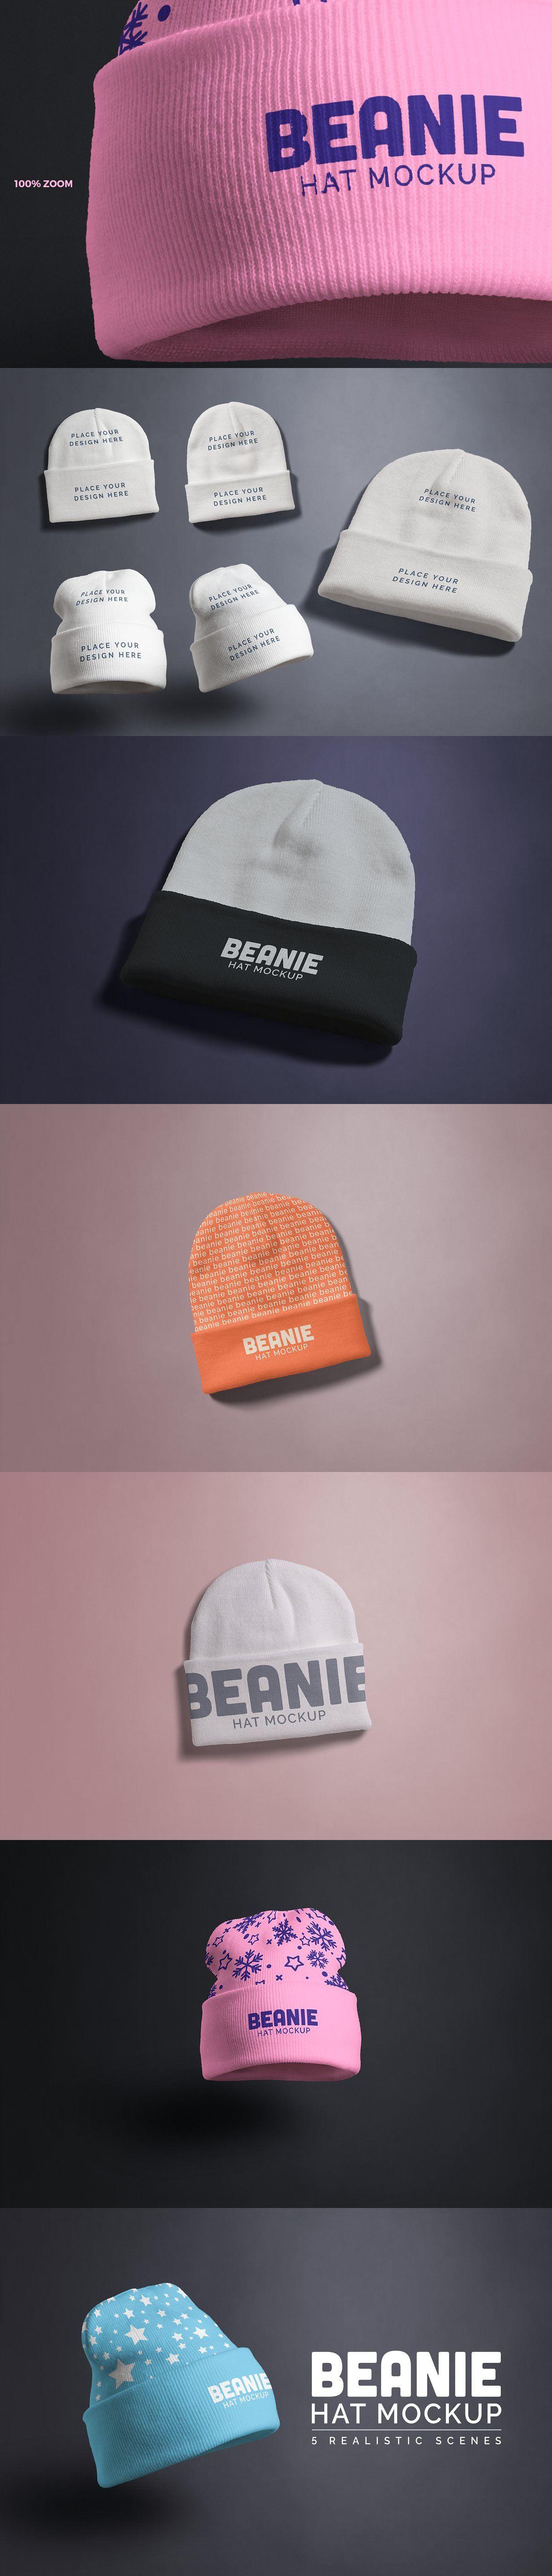 Download Beanie Hat Mock Up Beanie Hats Winter Design Blank Hats